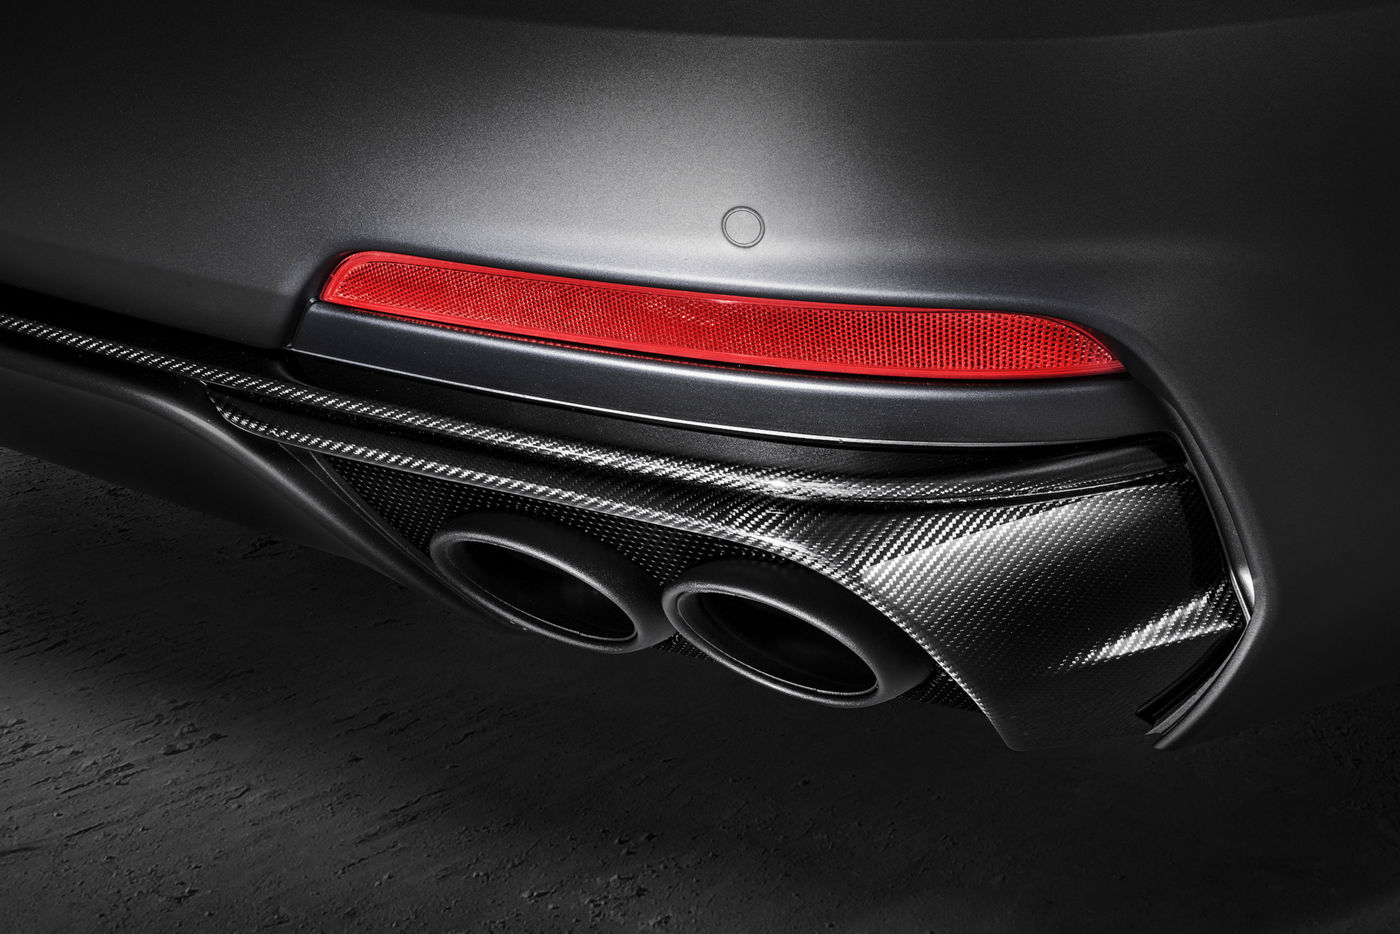 Maserati Levante Trofeo - exaust pipes detail